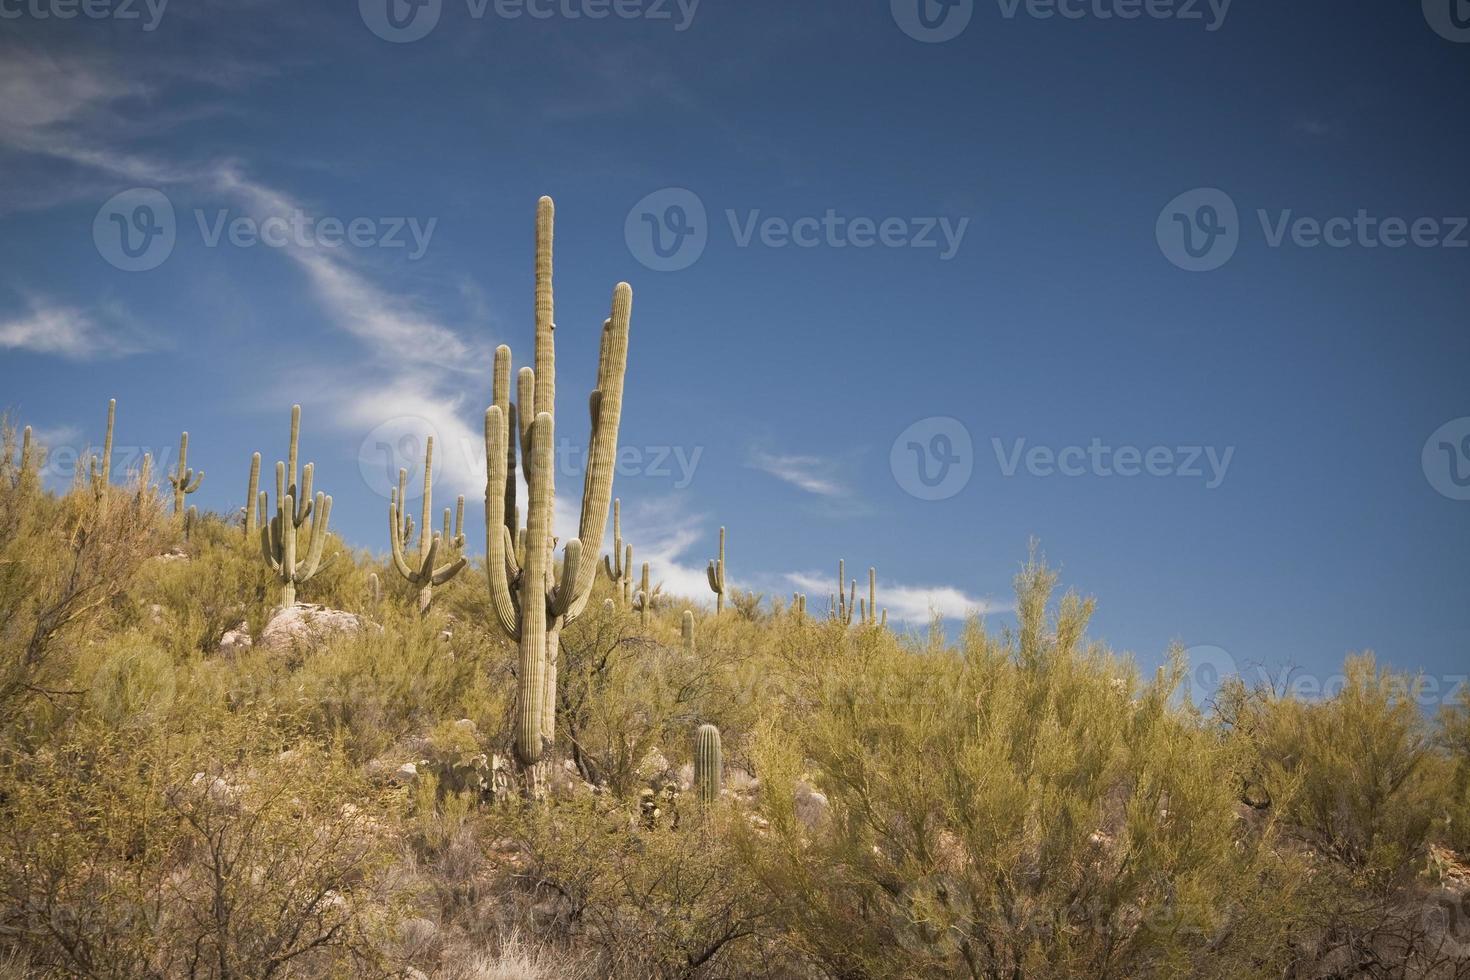 Desert Landscape - 1 cactus with mountains photo